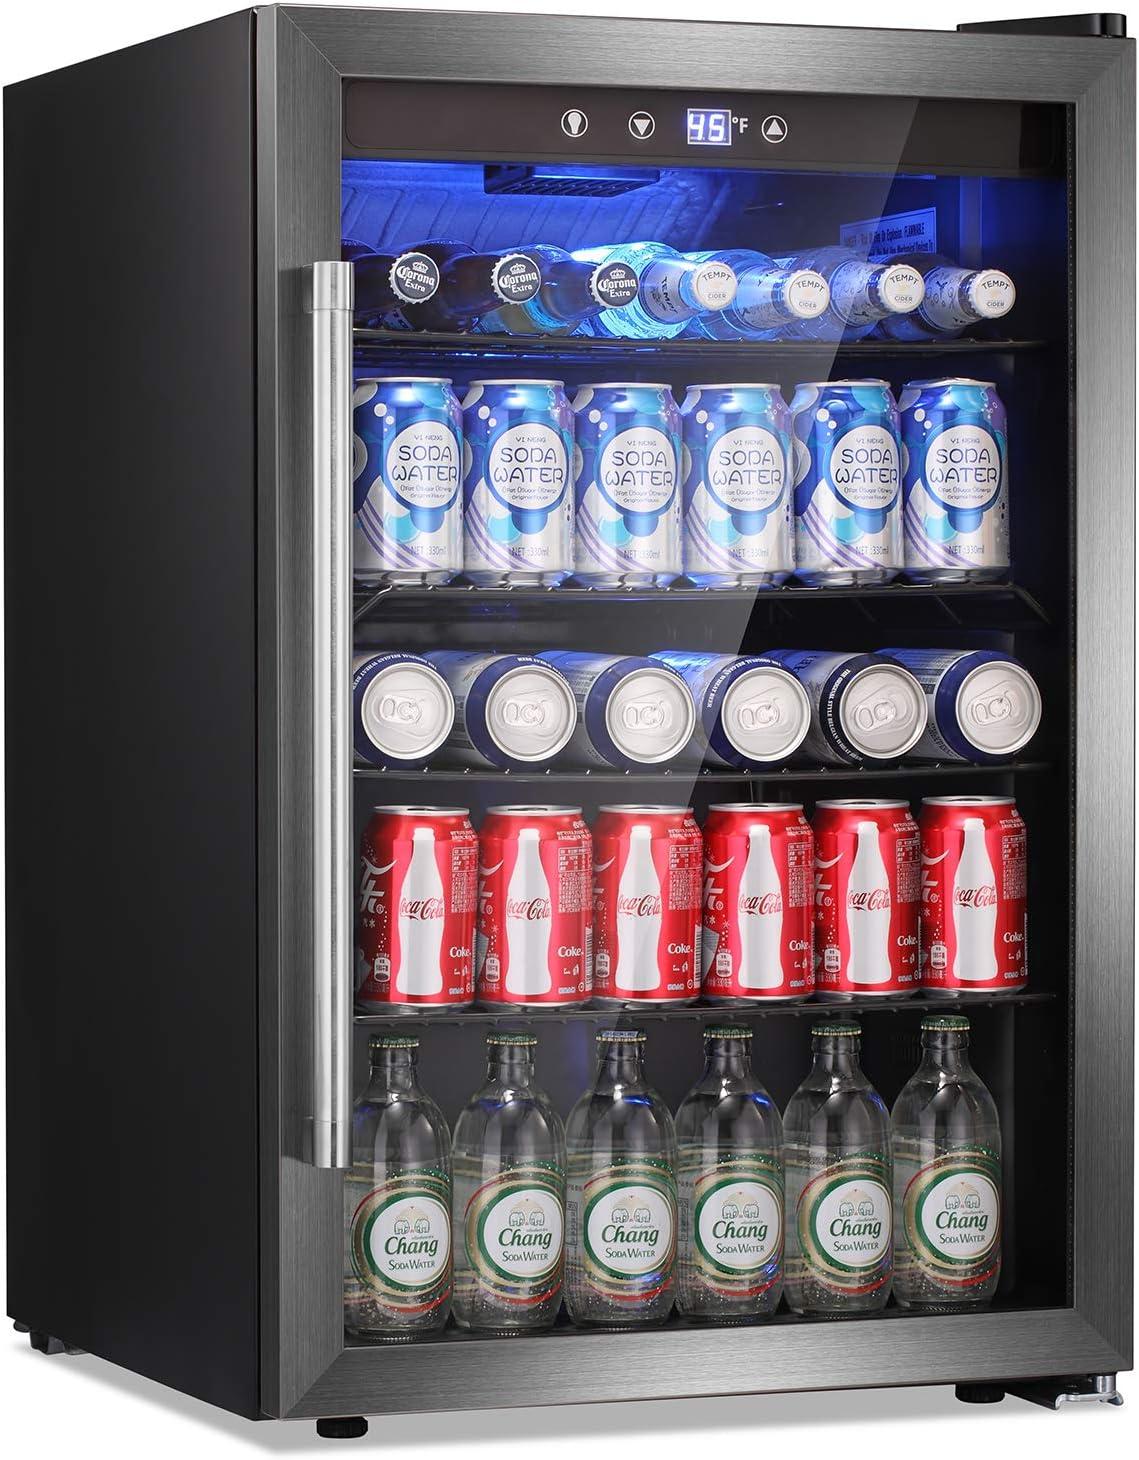 Antarctic Star Beverage Refrigerator Cooler 2021 new 145 Can Fridg - shopping Mini